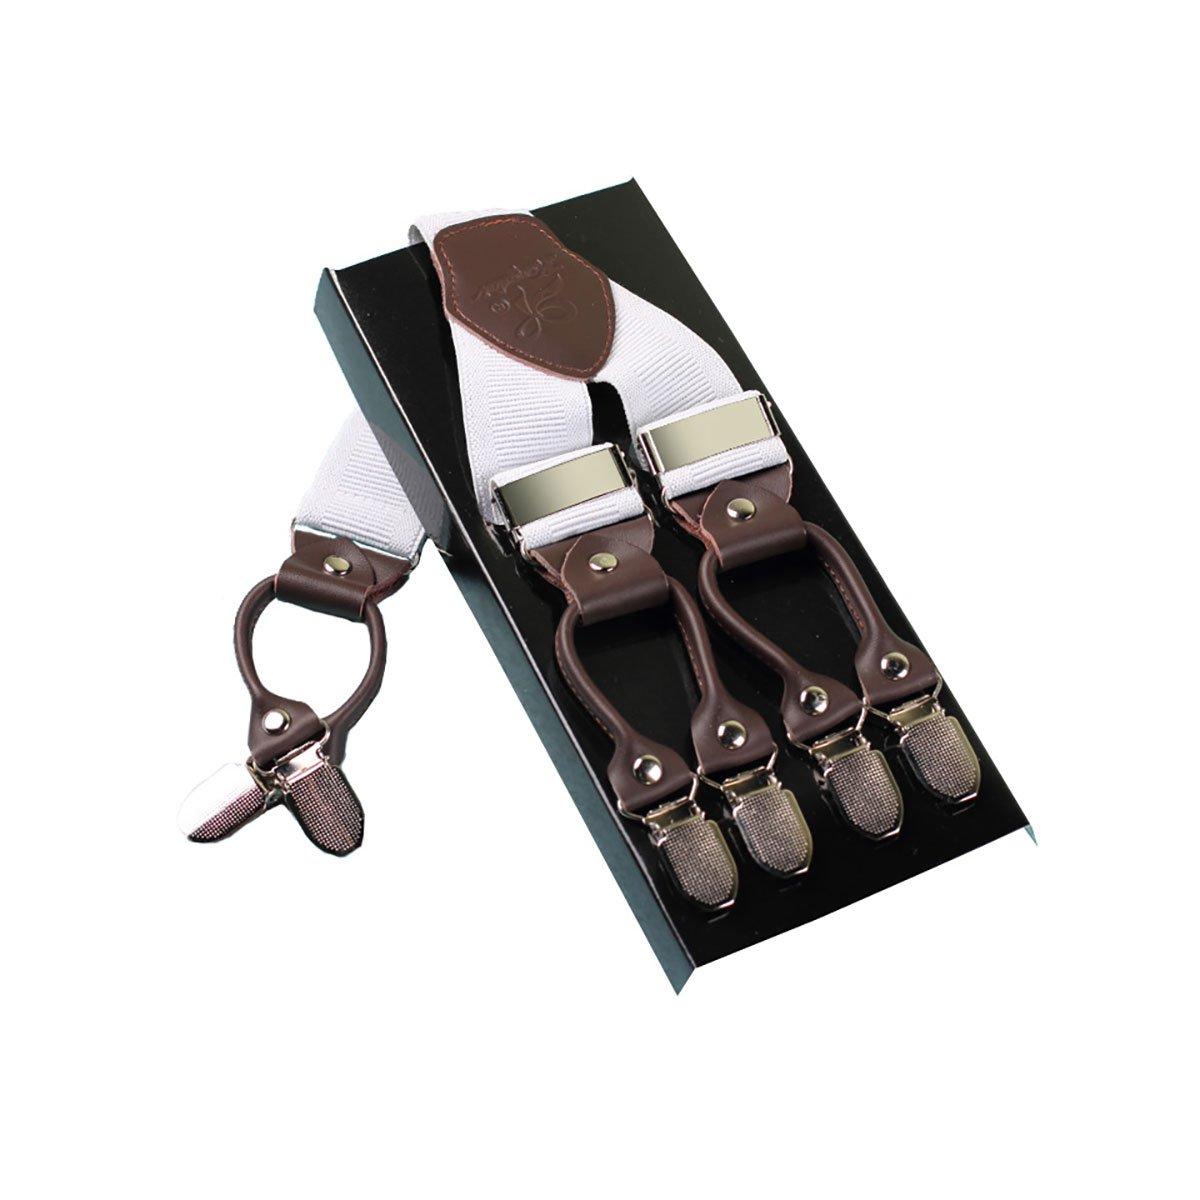 Robusto Uomini Braces KANGDAI 6 Fibbie Y Indietro 10 colori Suspendenti regolabili elastici durevoli Forti clip metalliche